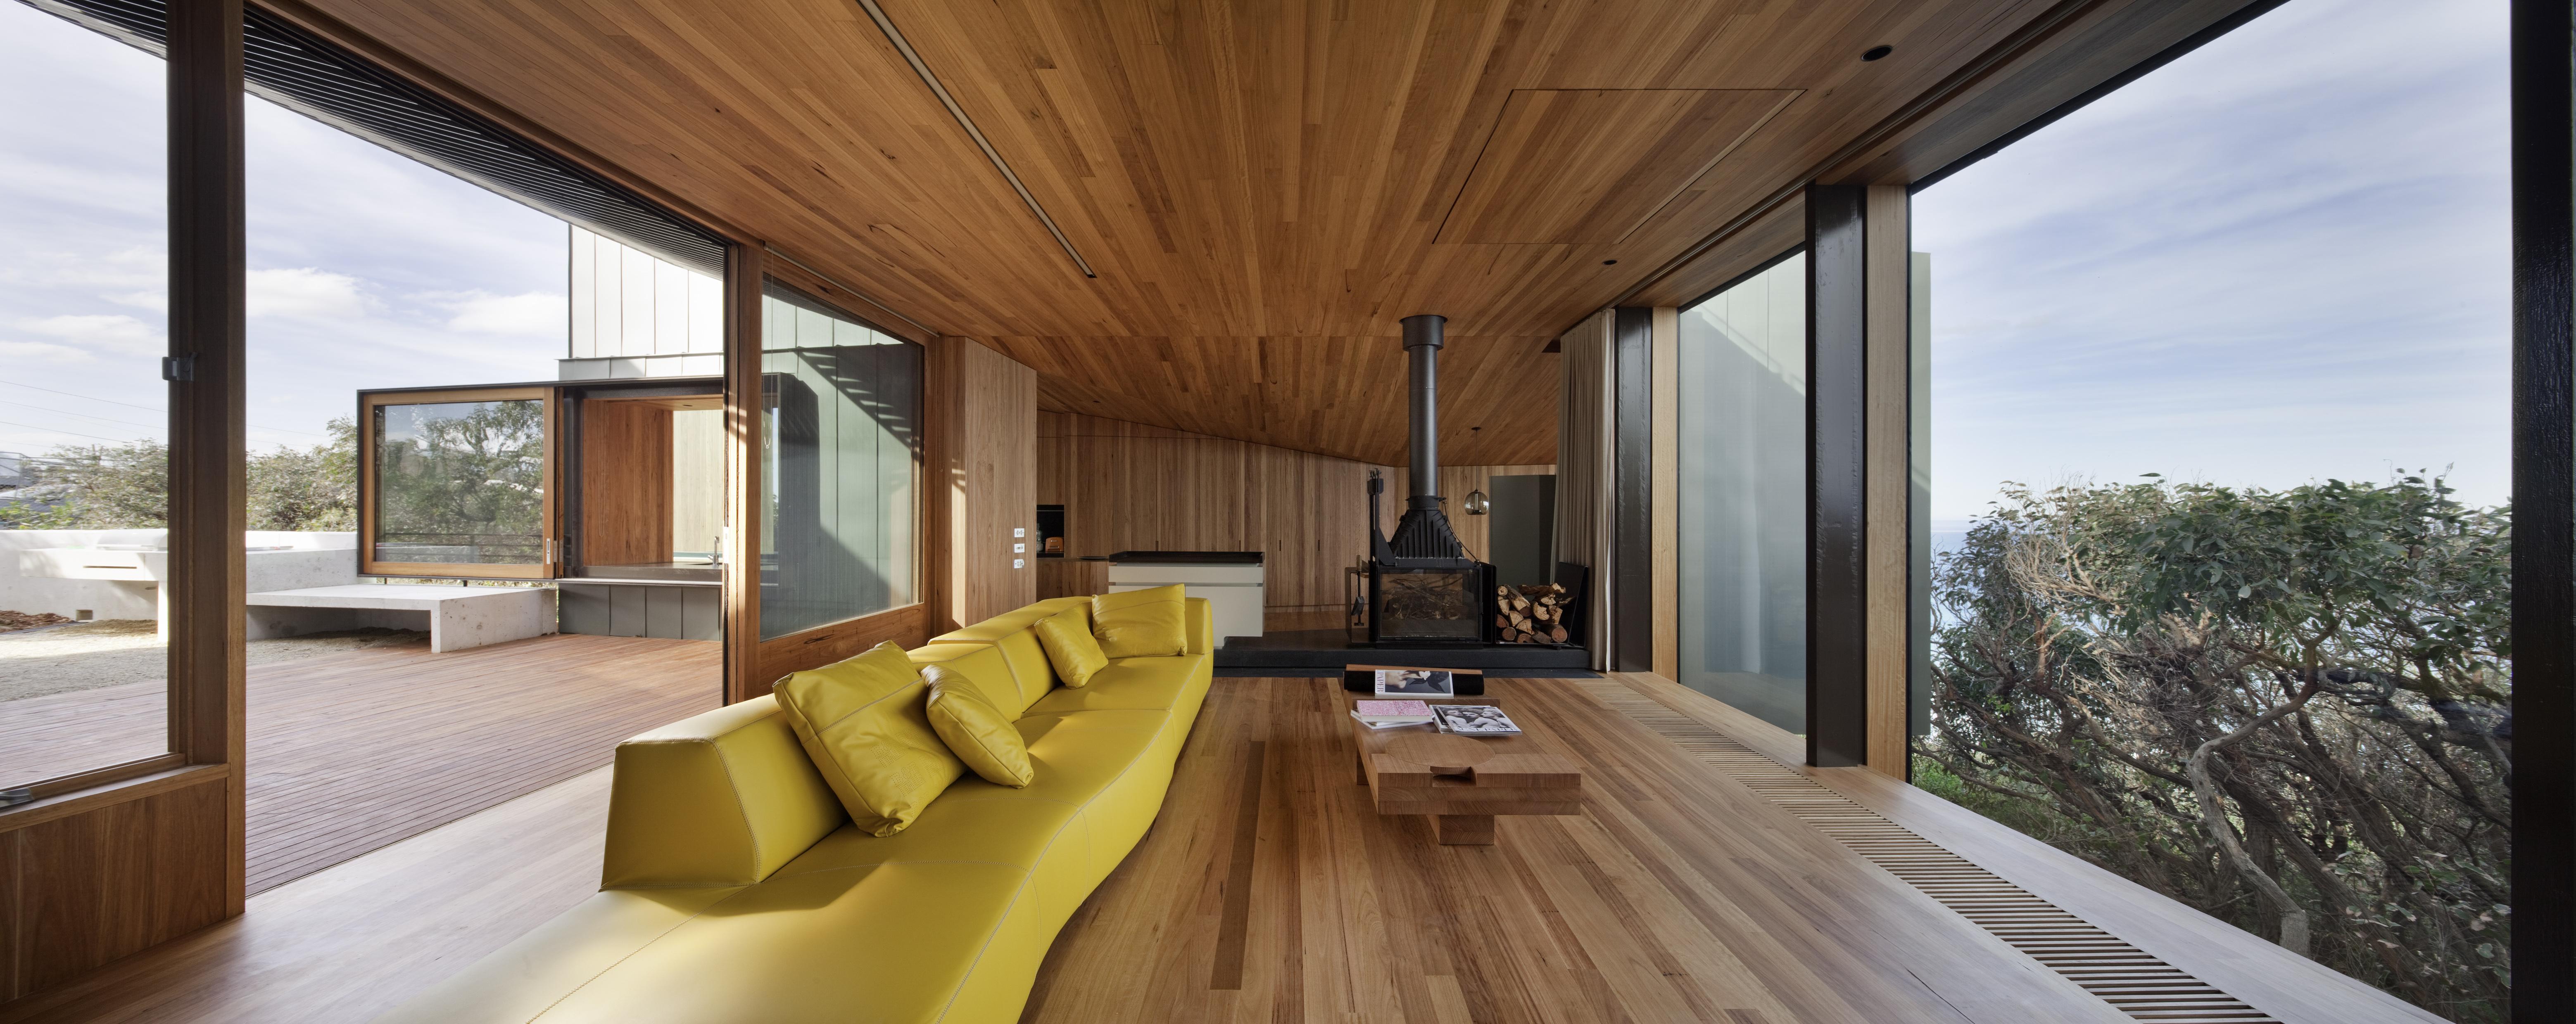 IDEA_JWA_Fairhaven Residence_TREVOR MEIN_4